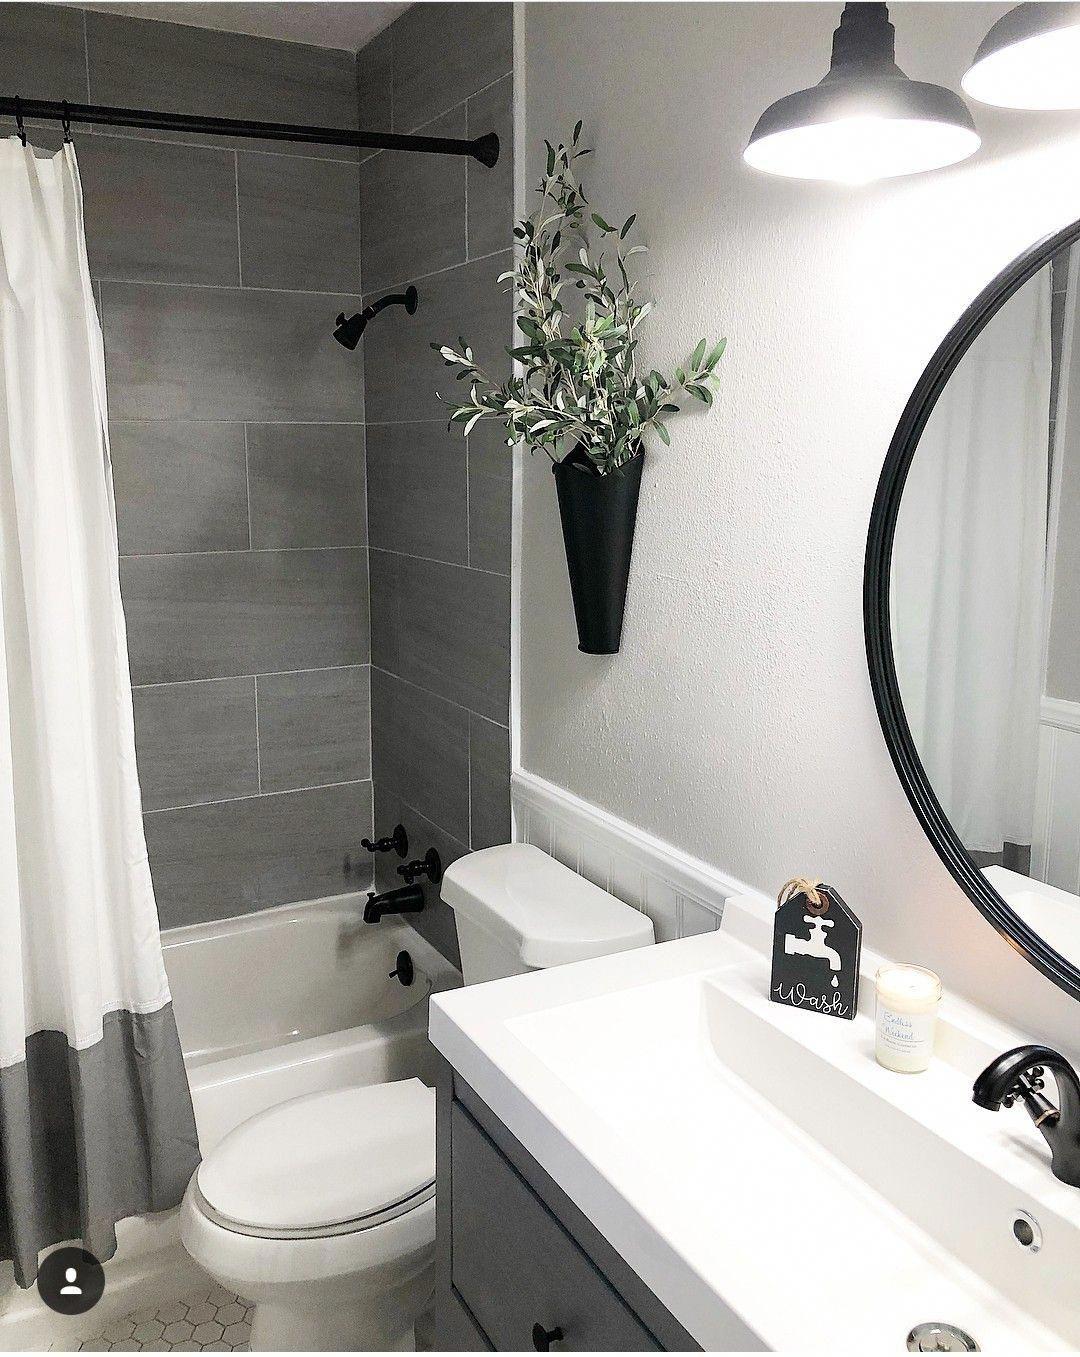 Solar Tube Bathroom Fan Apartment Bathroom Design Small Bathroom Interior Bathroom Design Small